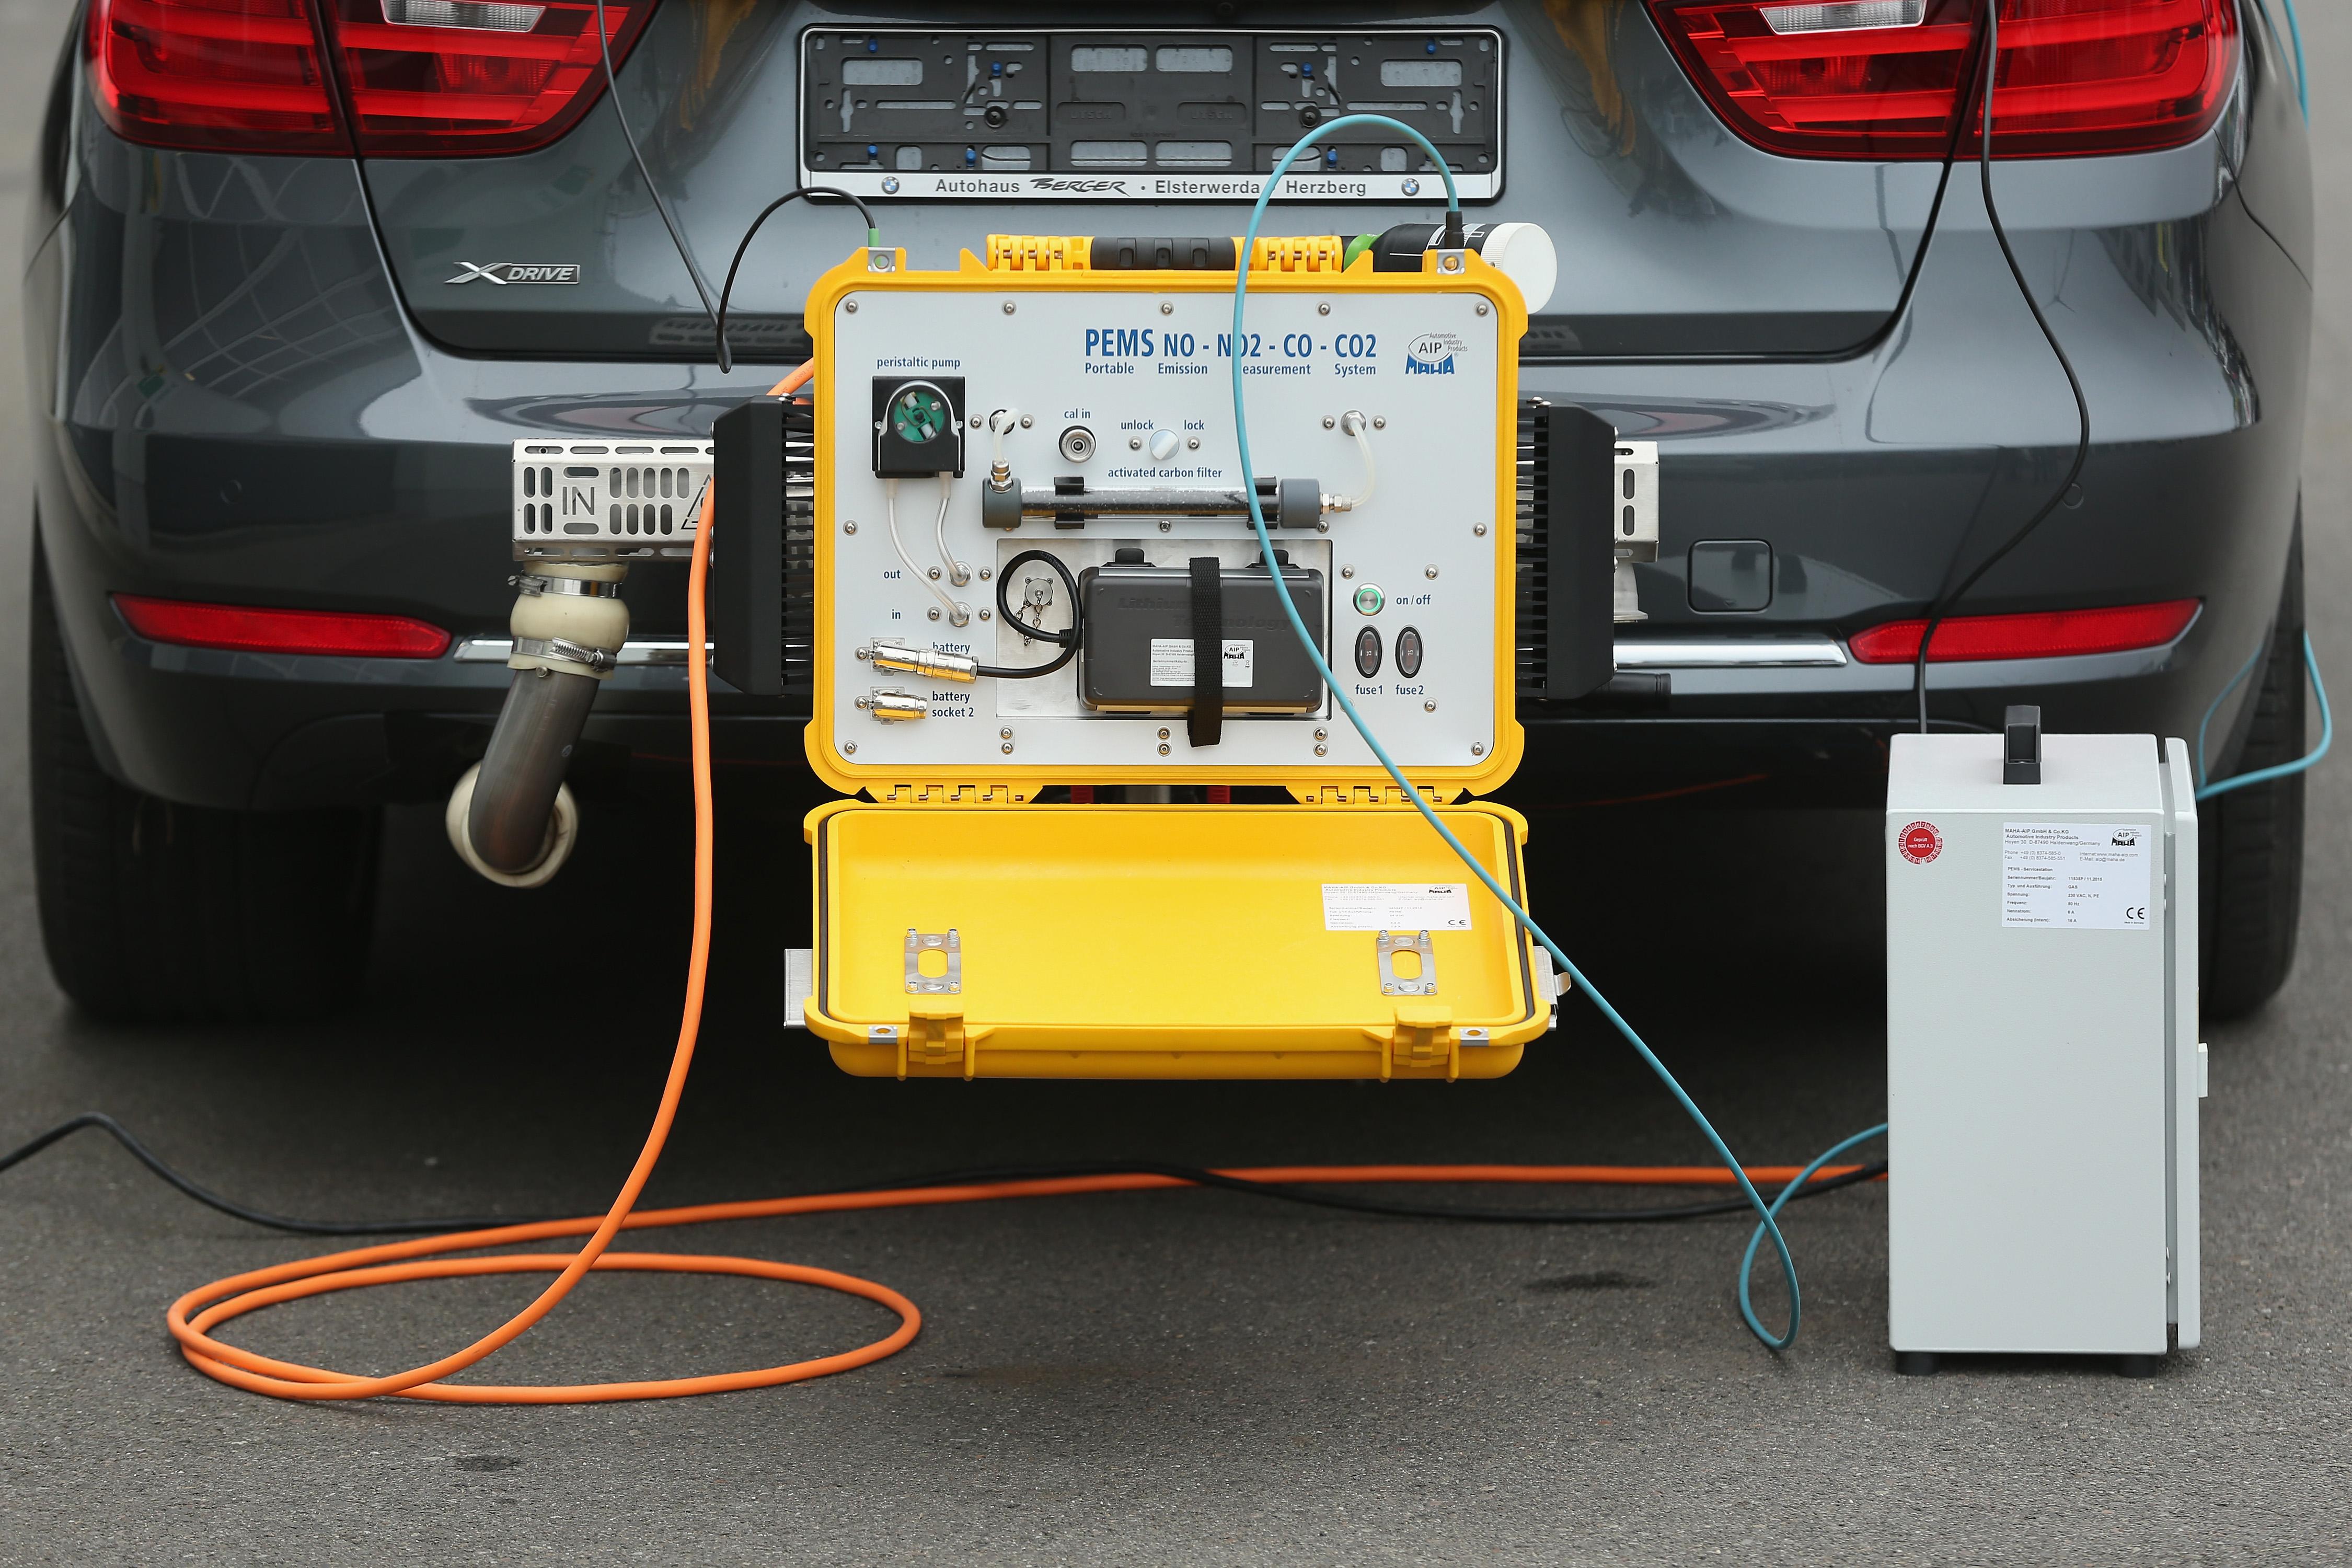 Emissions Testing At DEKRA Facility